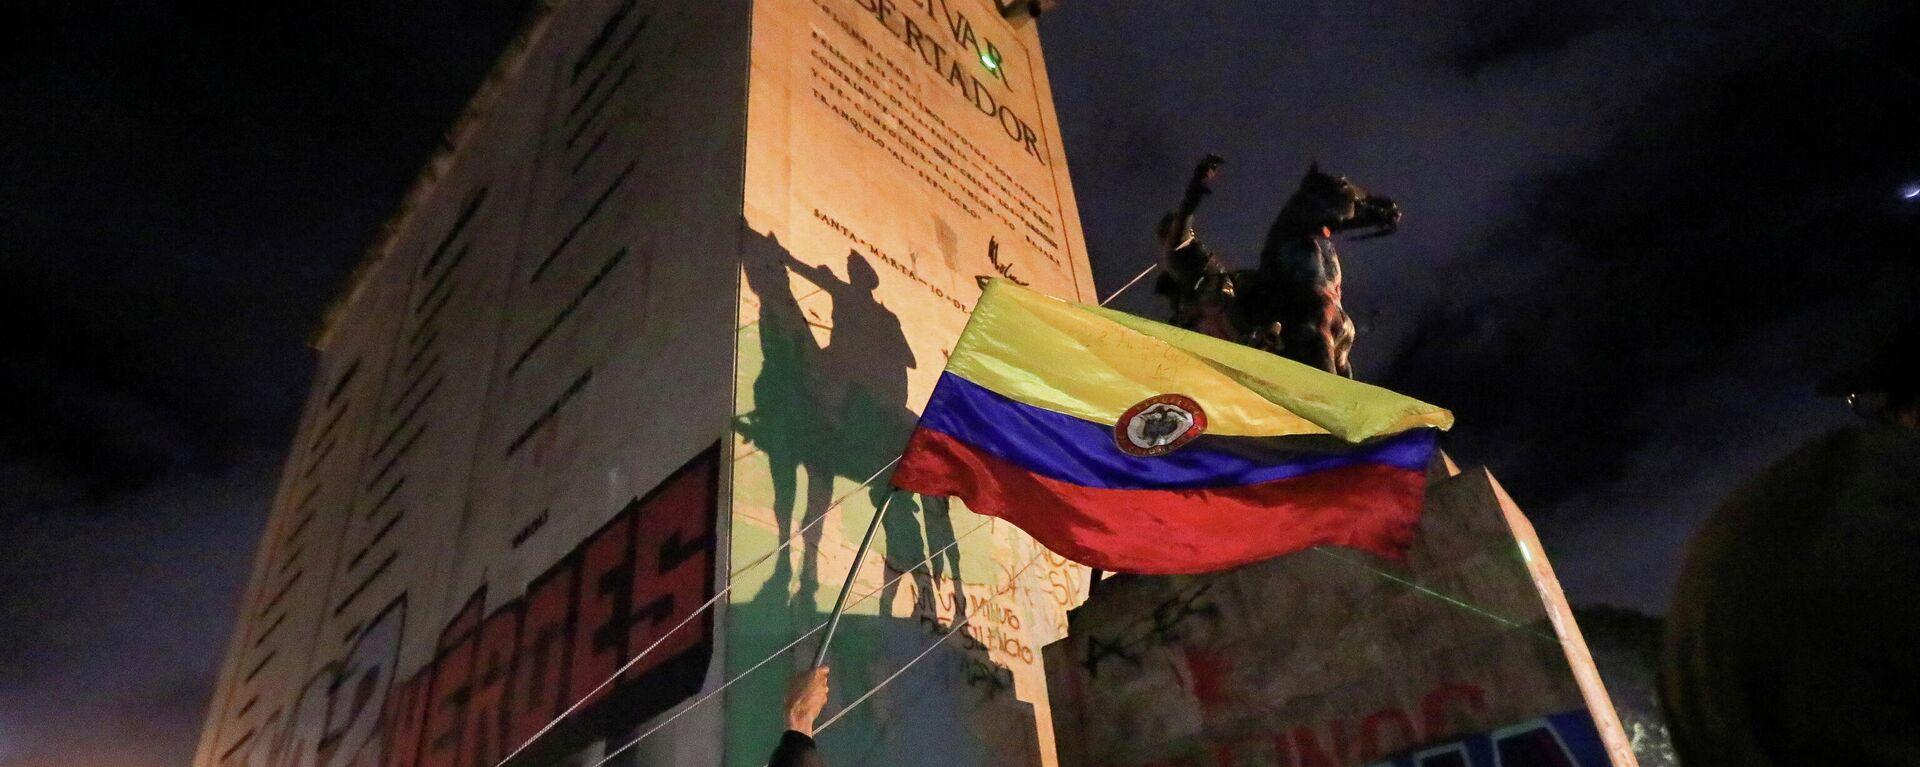 Protestas en Bogotá, Colombia - Sputnik Mundo, 1920, 09.06.2021